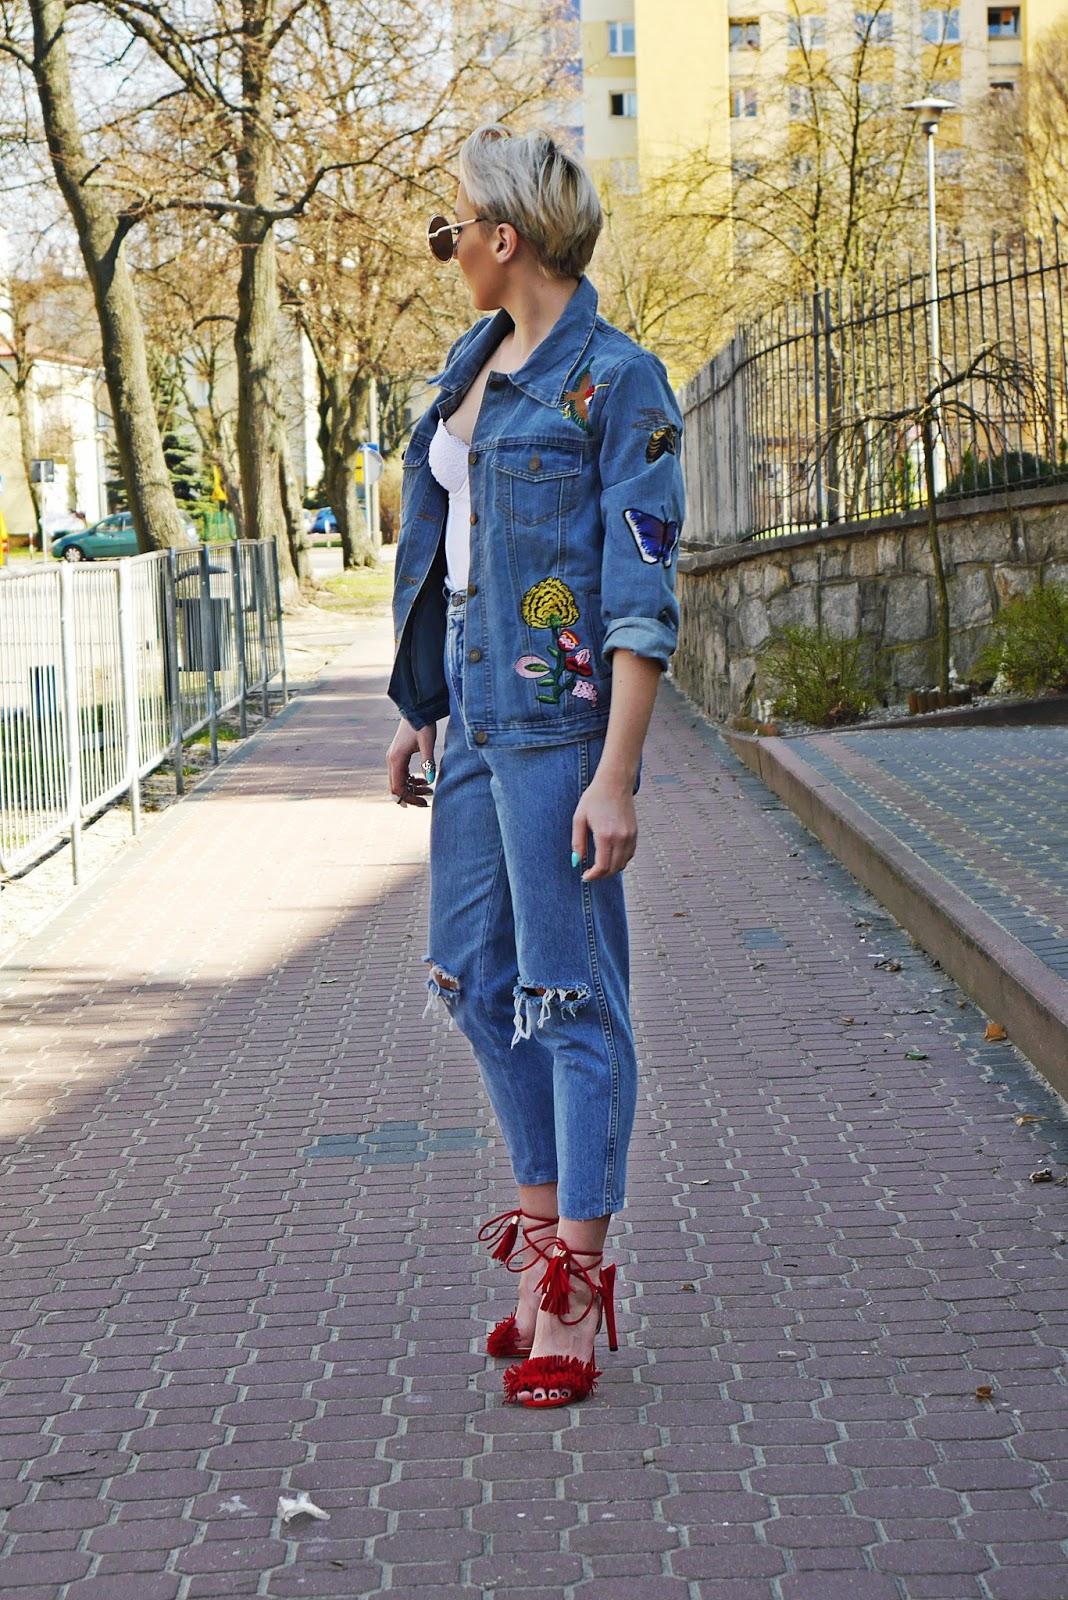 blogerka_modowa_blog_modowy_karyn_pulawy_ootd_look_060317b